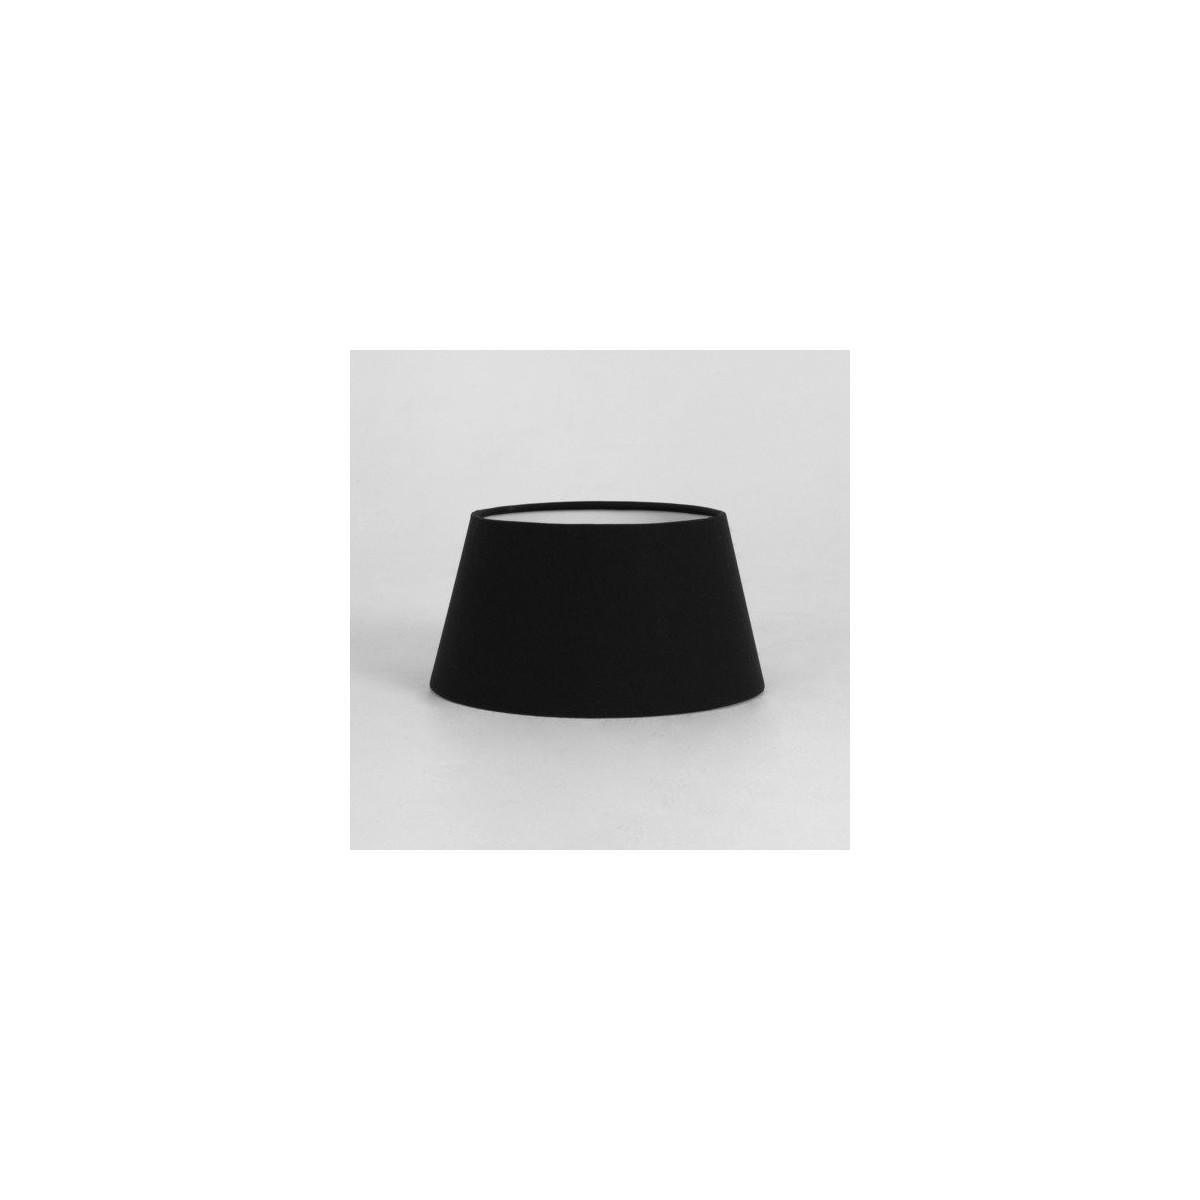 Astro Tapered Drum 95 Abażur Czarny 5013004